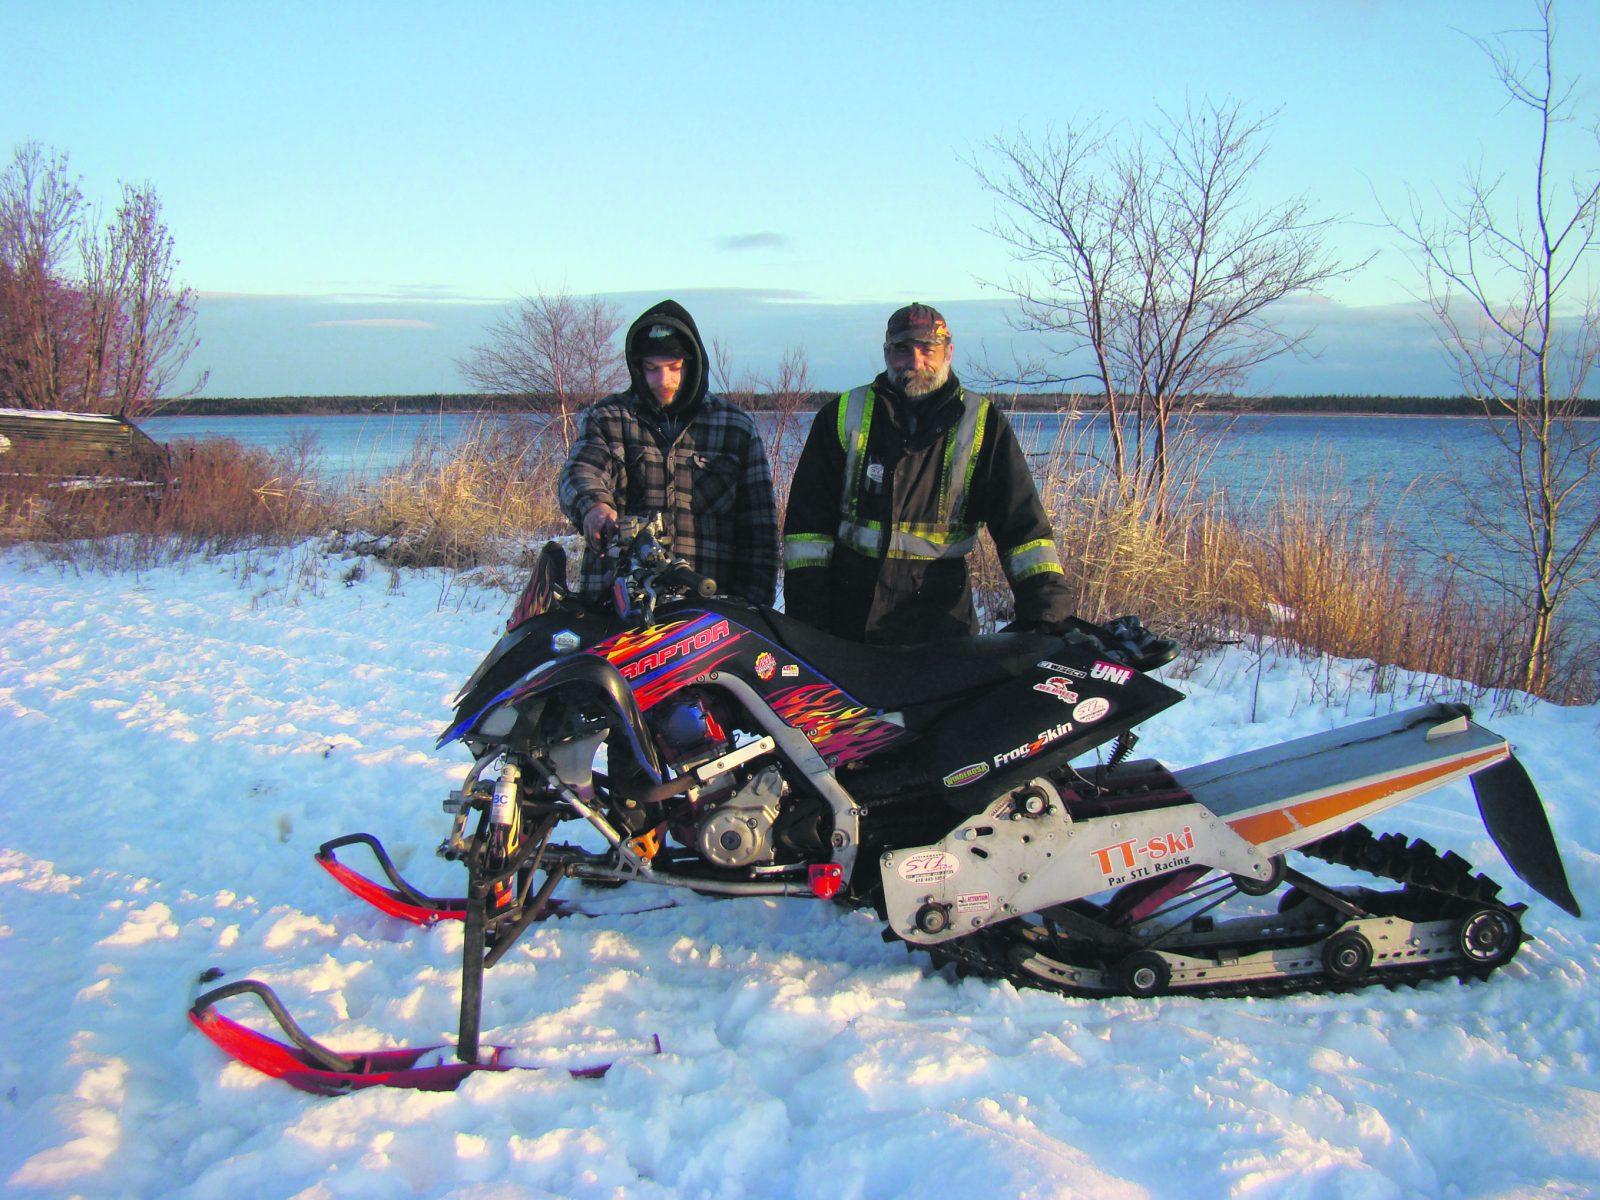 Le TT-ski transforme un VTT en motoneige